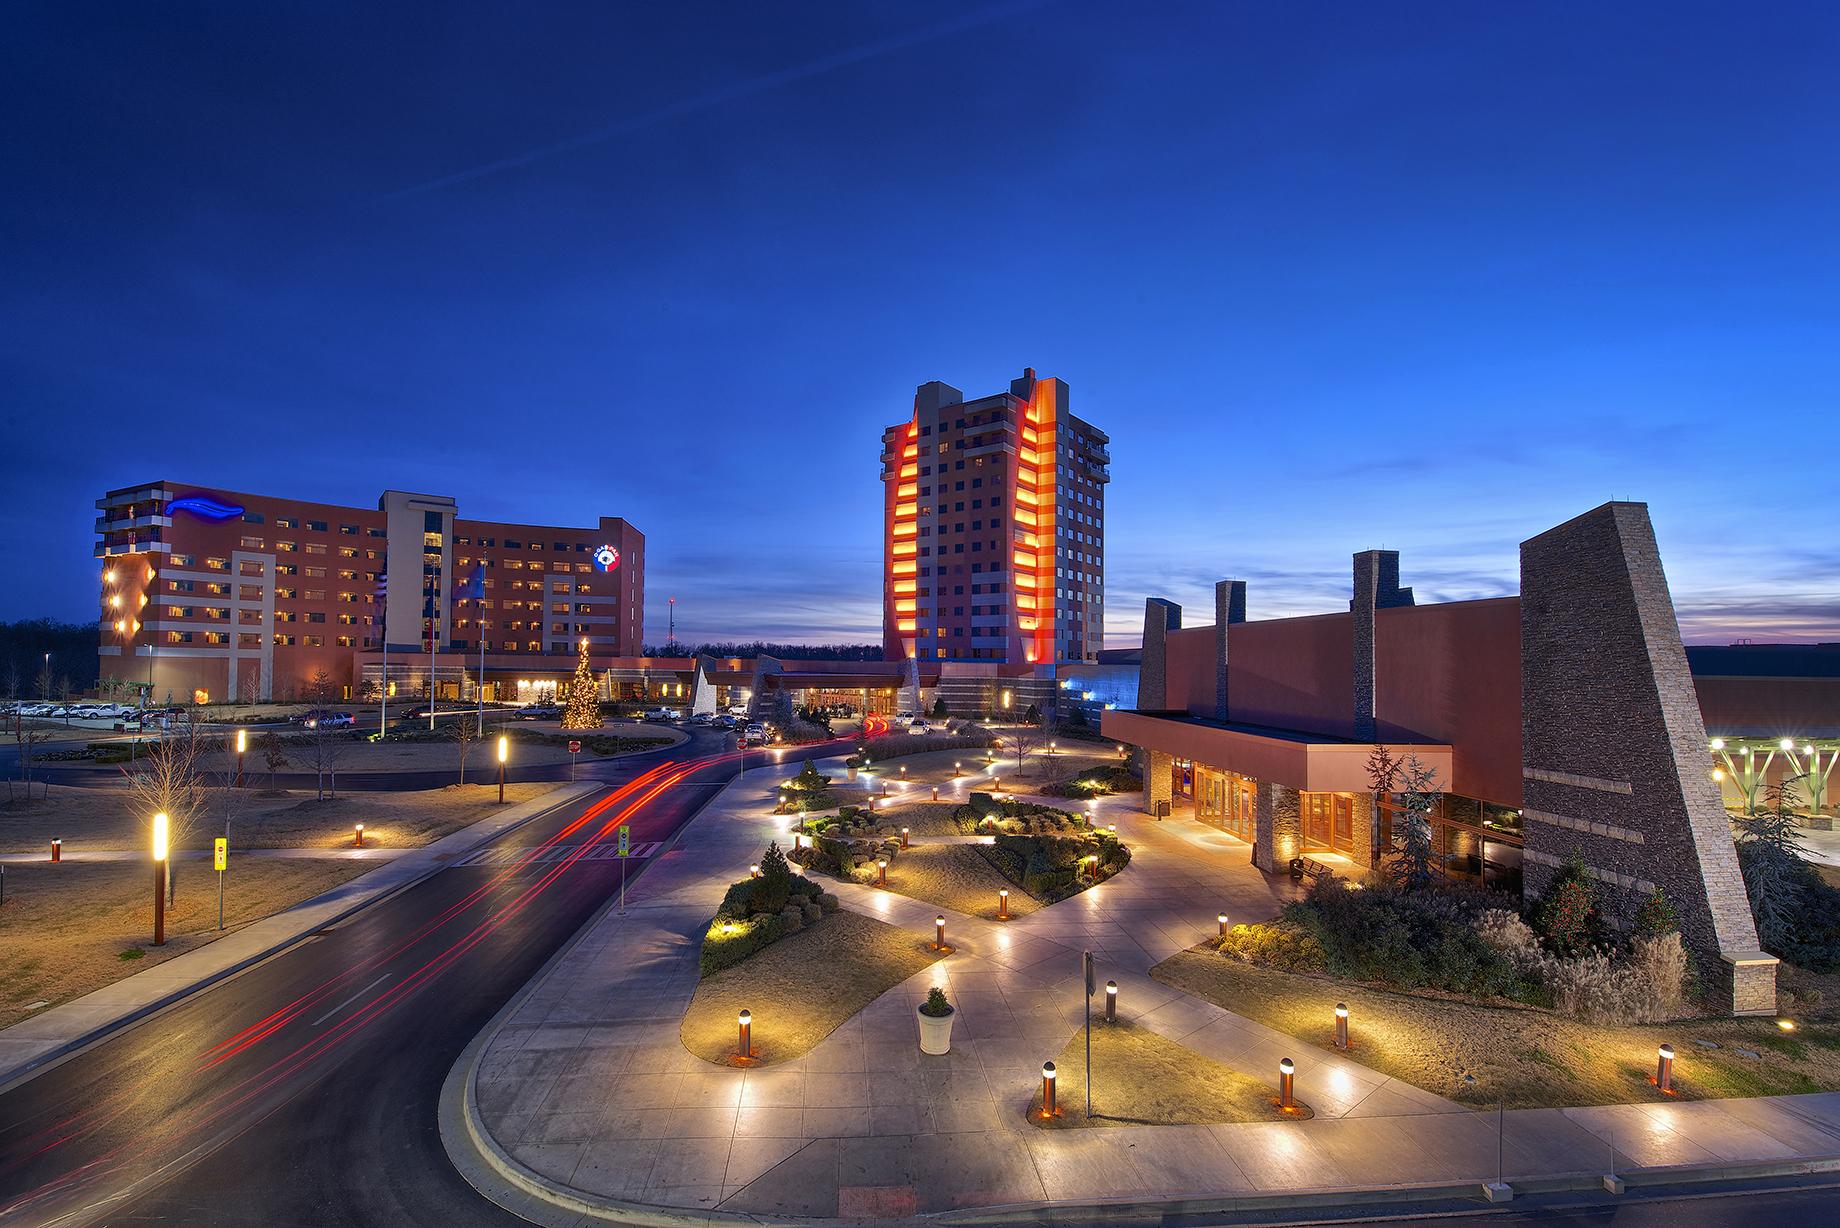 Downstream Casino Exterior Night Photo